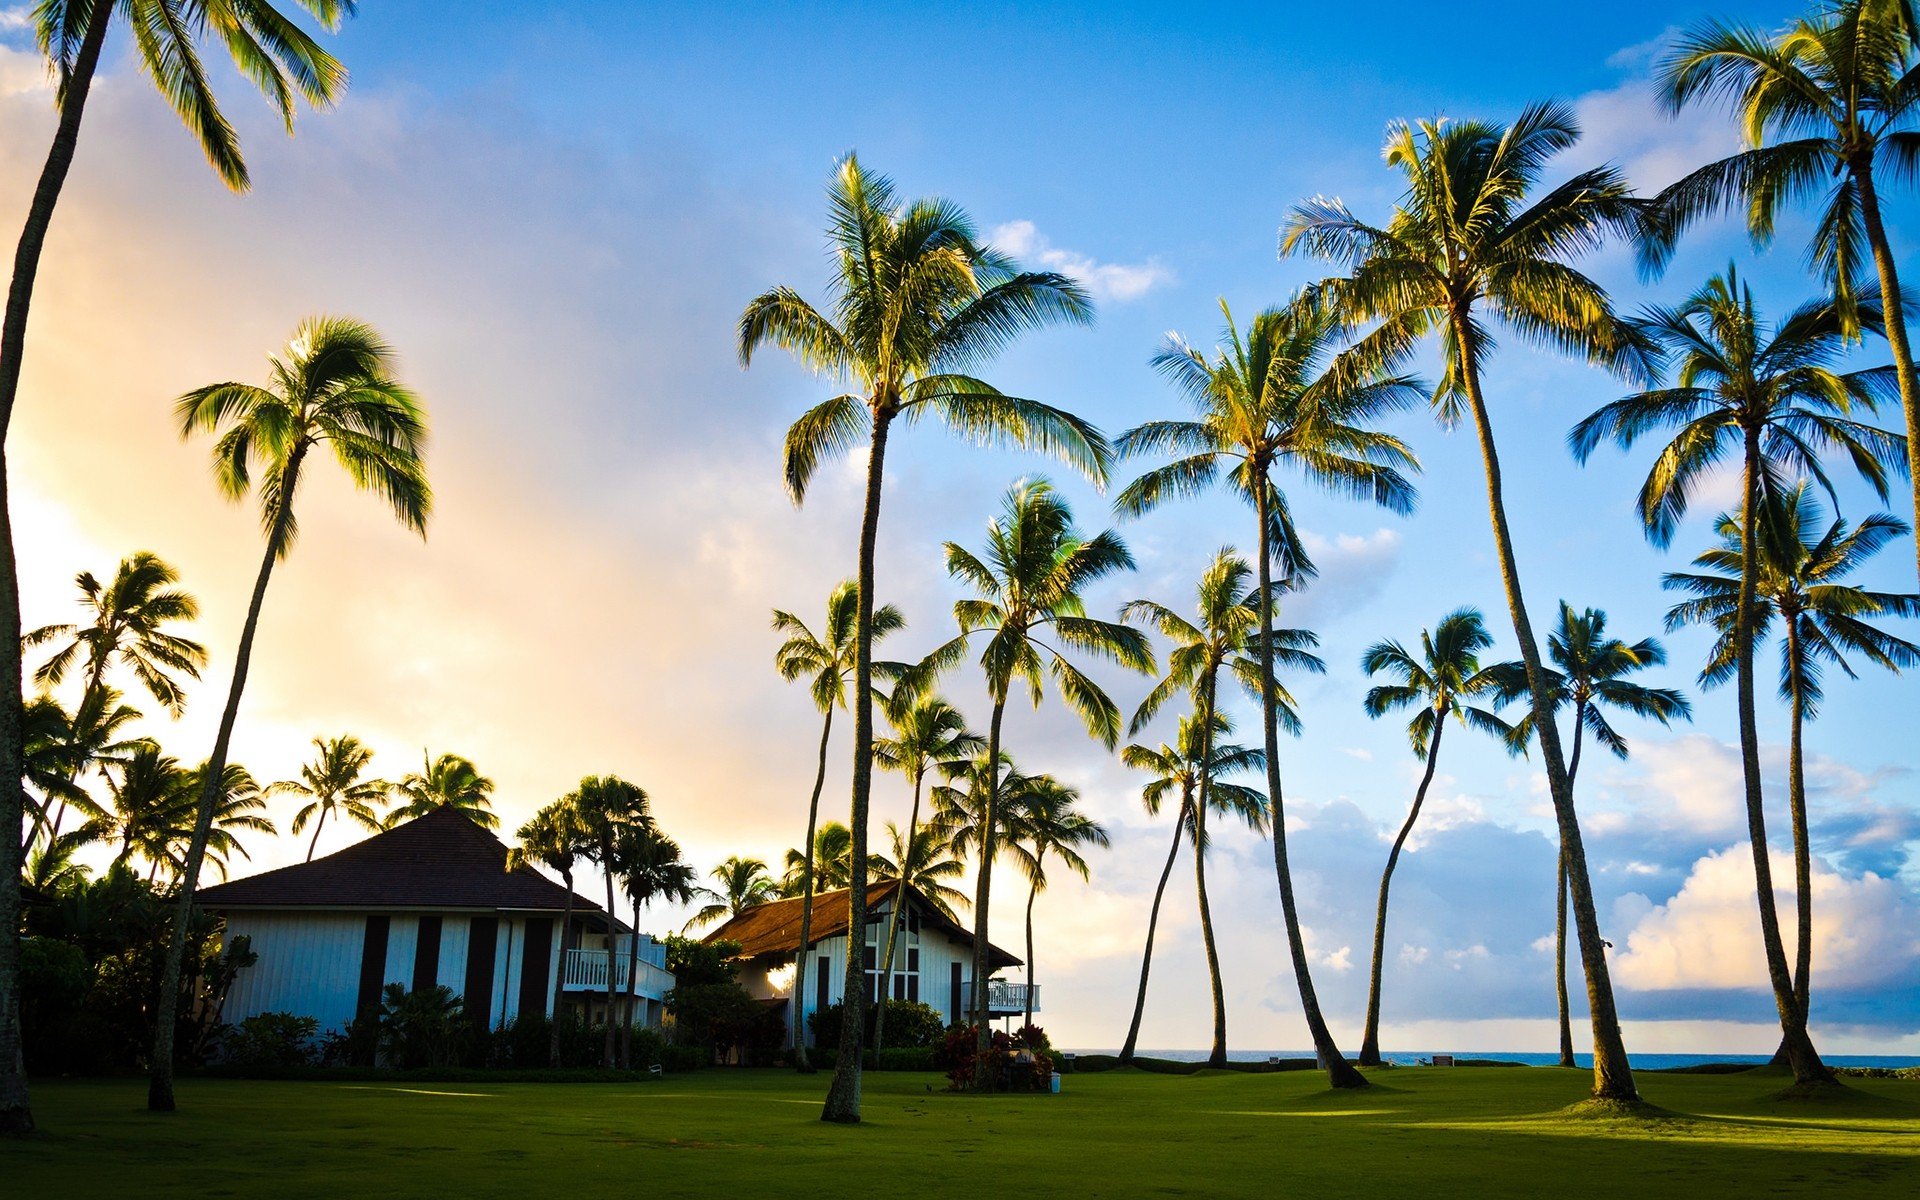 Hawaii Beach Houses 4K Full Hd Backgrounds Wallpaper | HD Wallpapers